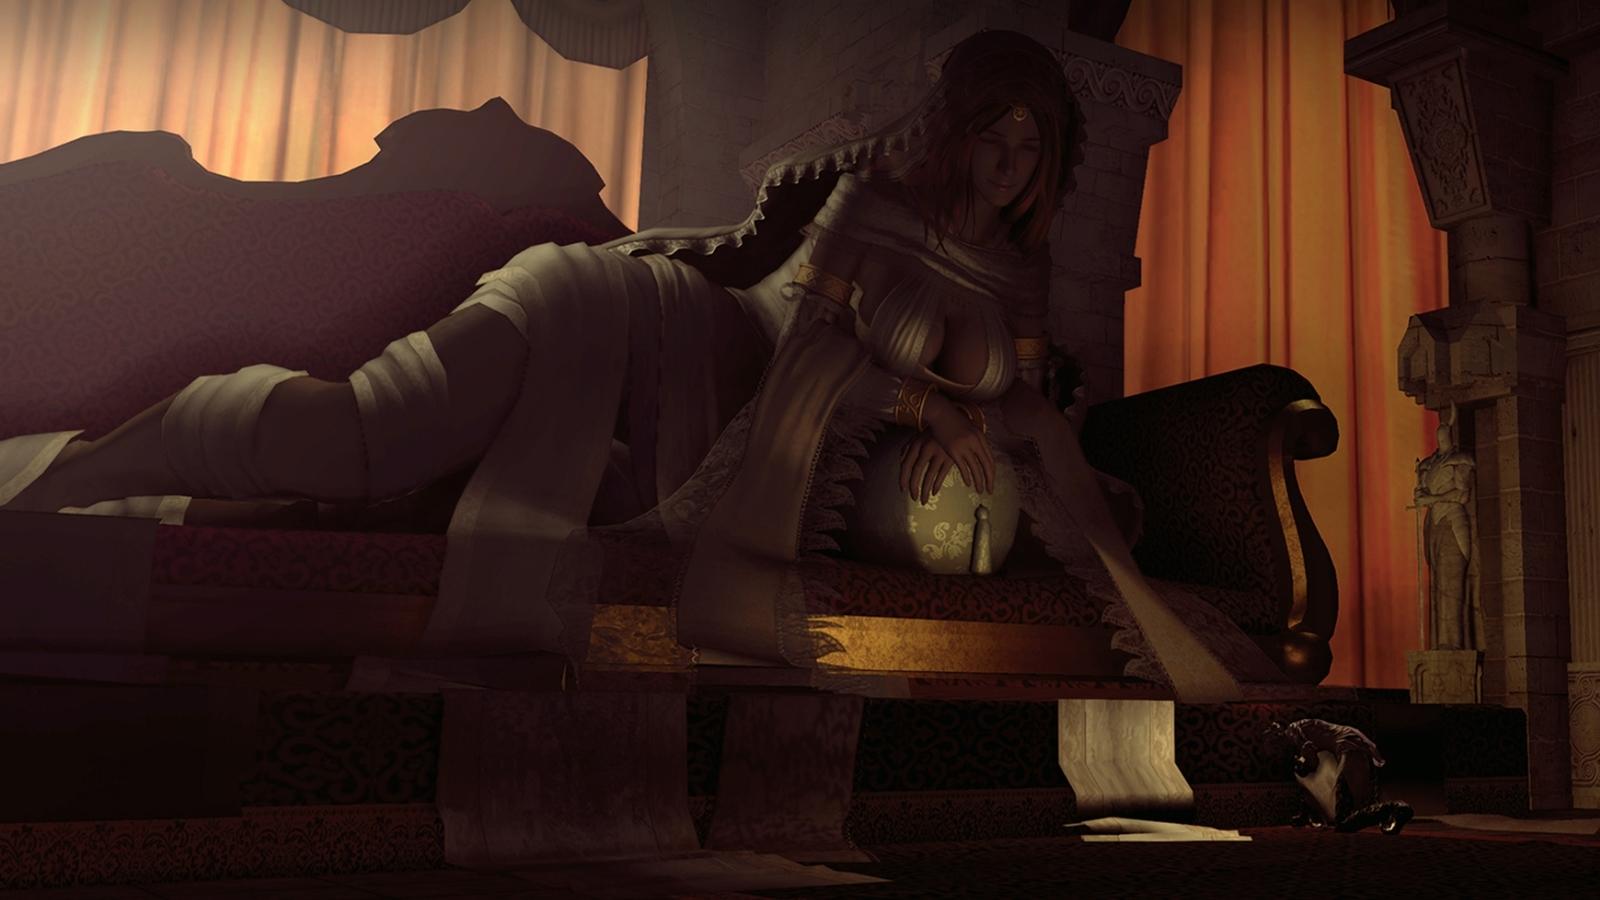 Gwynevere, Princess of Sunlight | Dark Souls Wiki | FANDOM powered